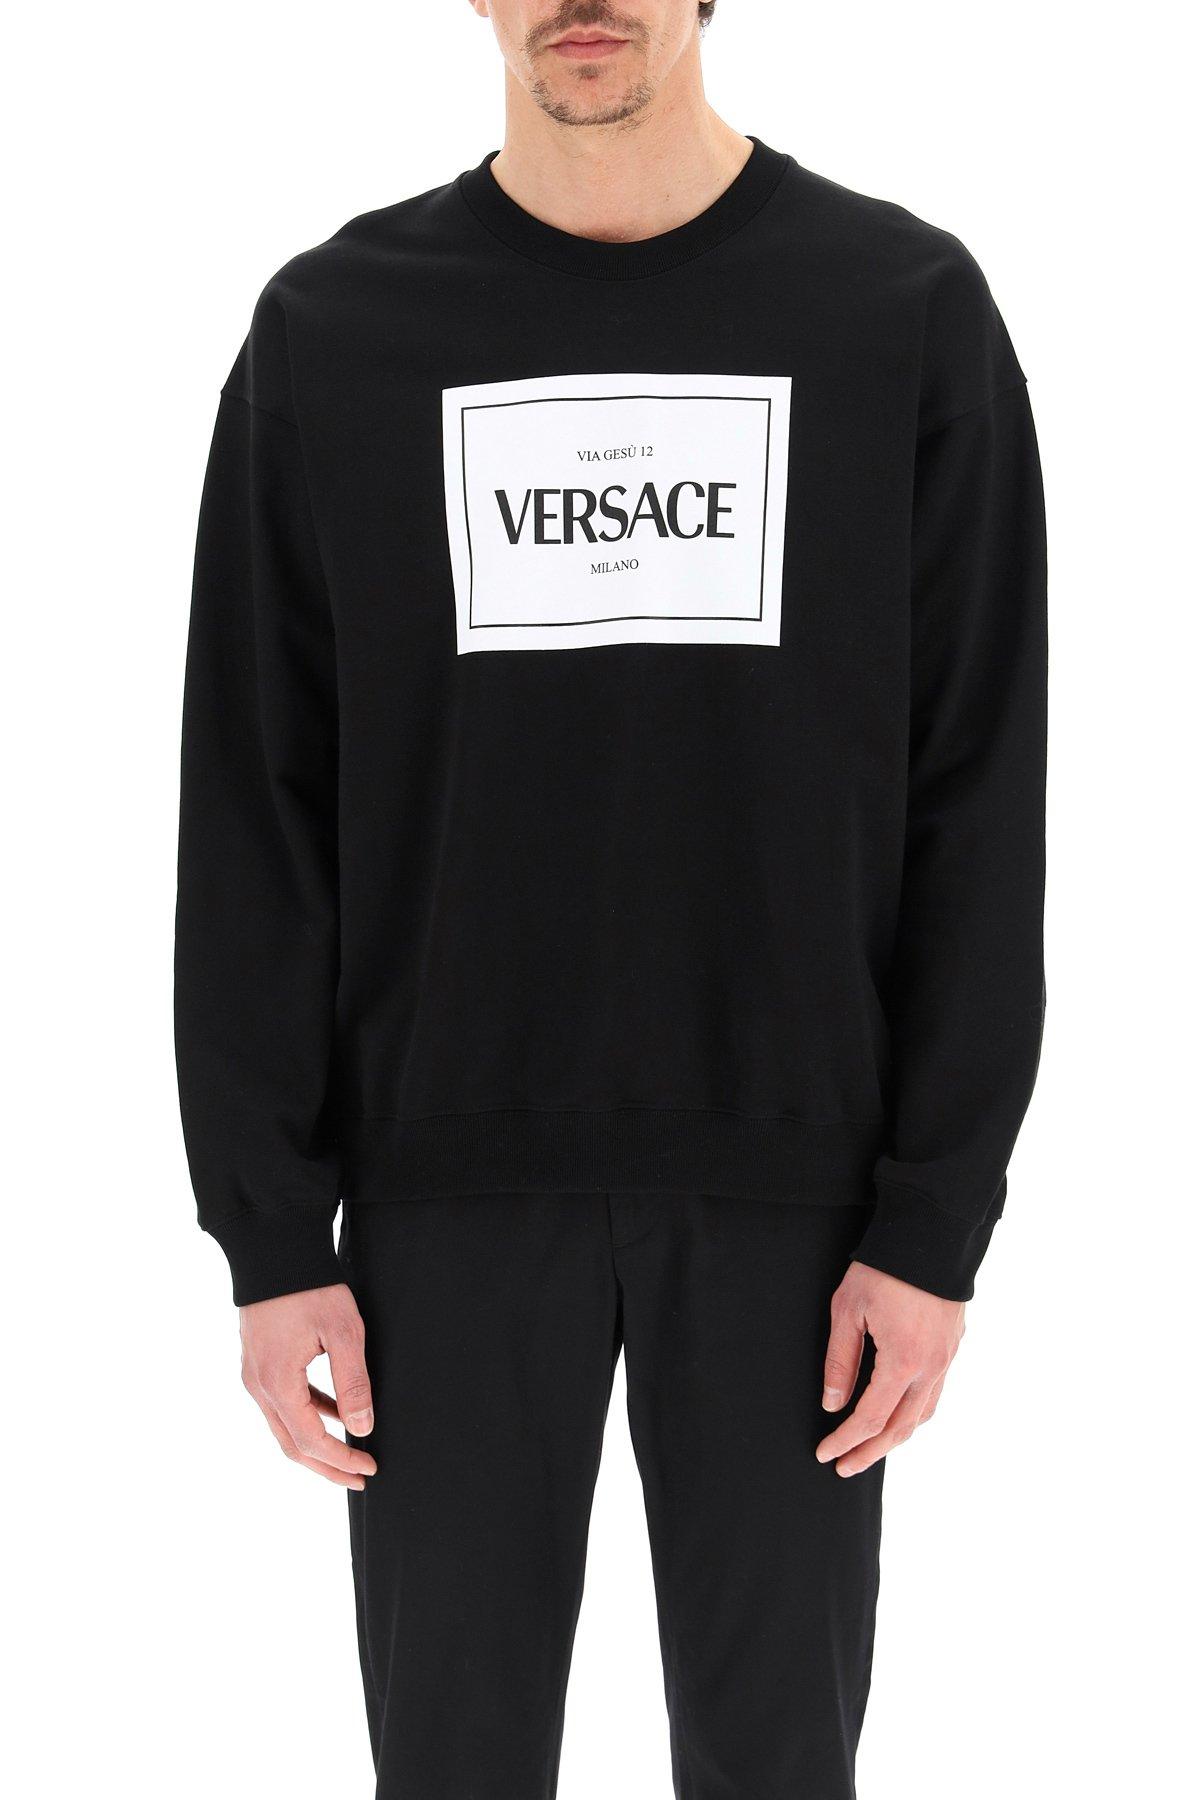 Versace felpa girocollo stampa logo